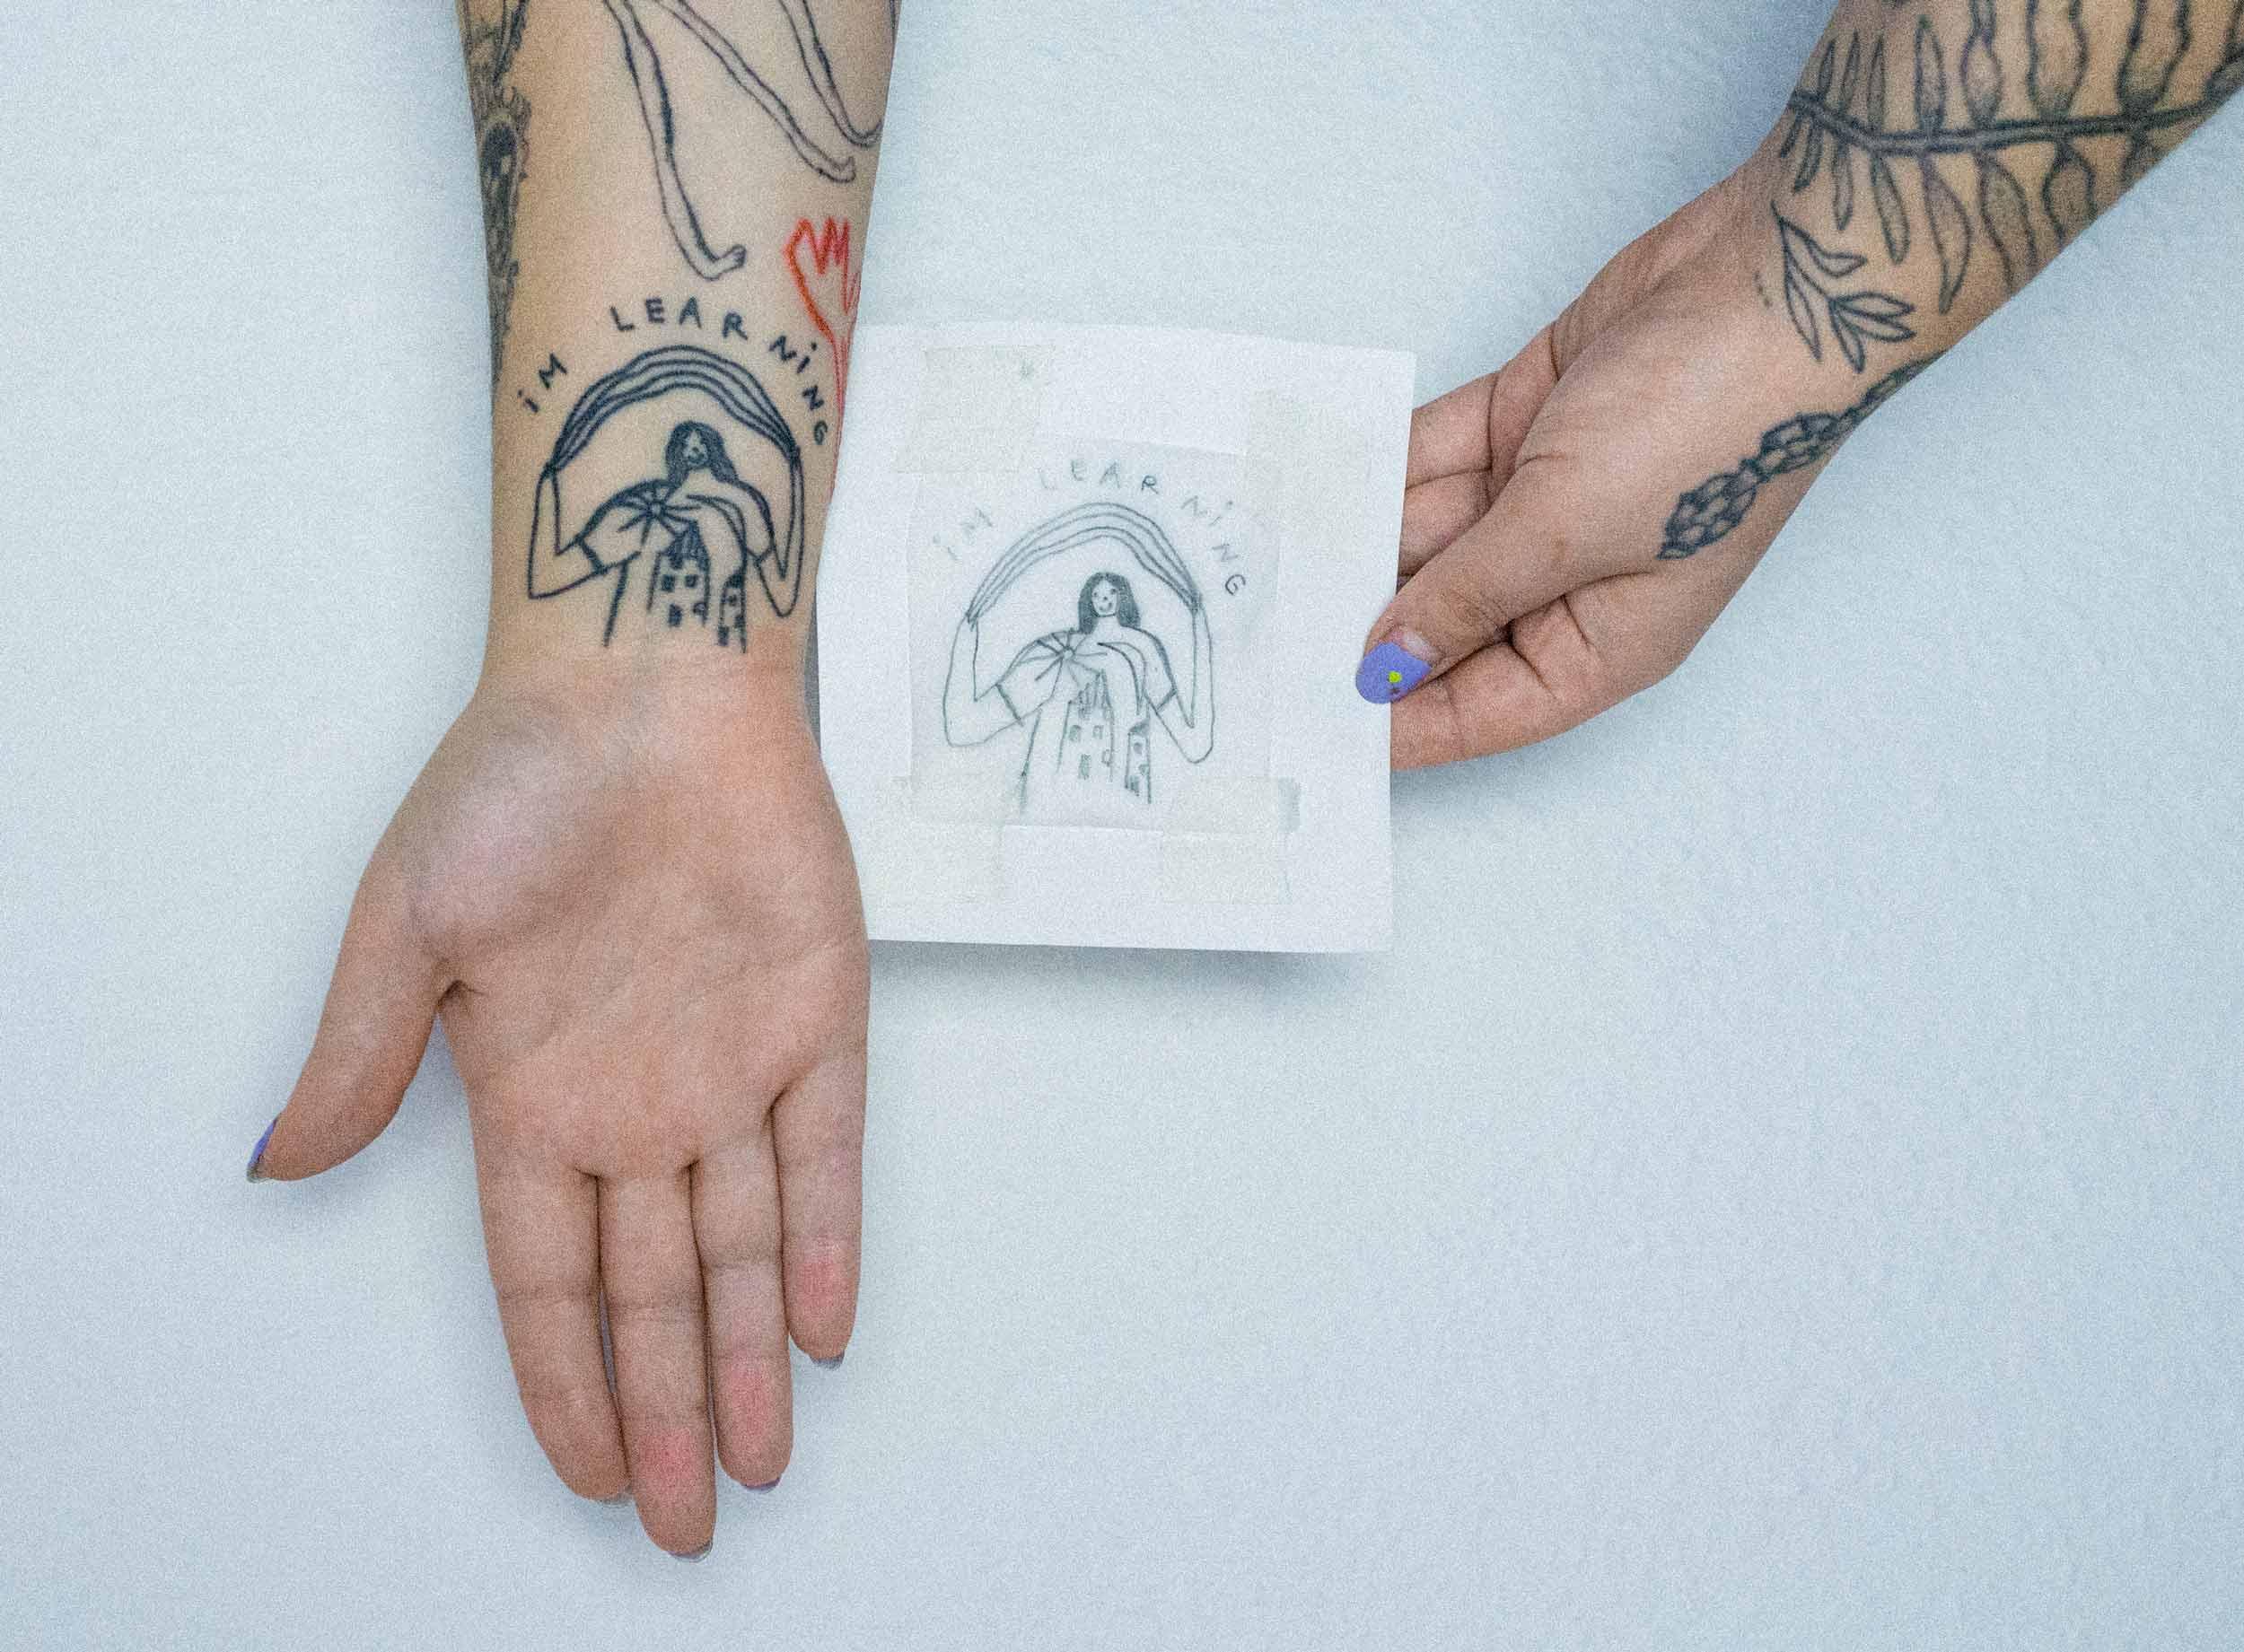 Everpress-blog-process-rio-sipos-iambabyking-tattoo-rita-salt